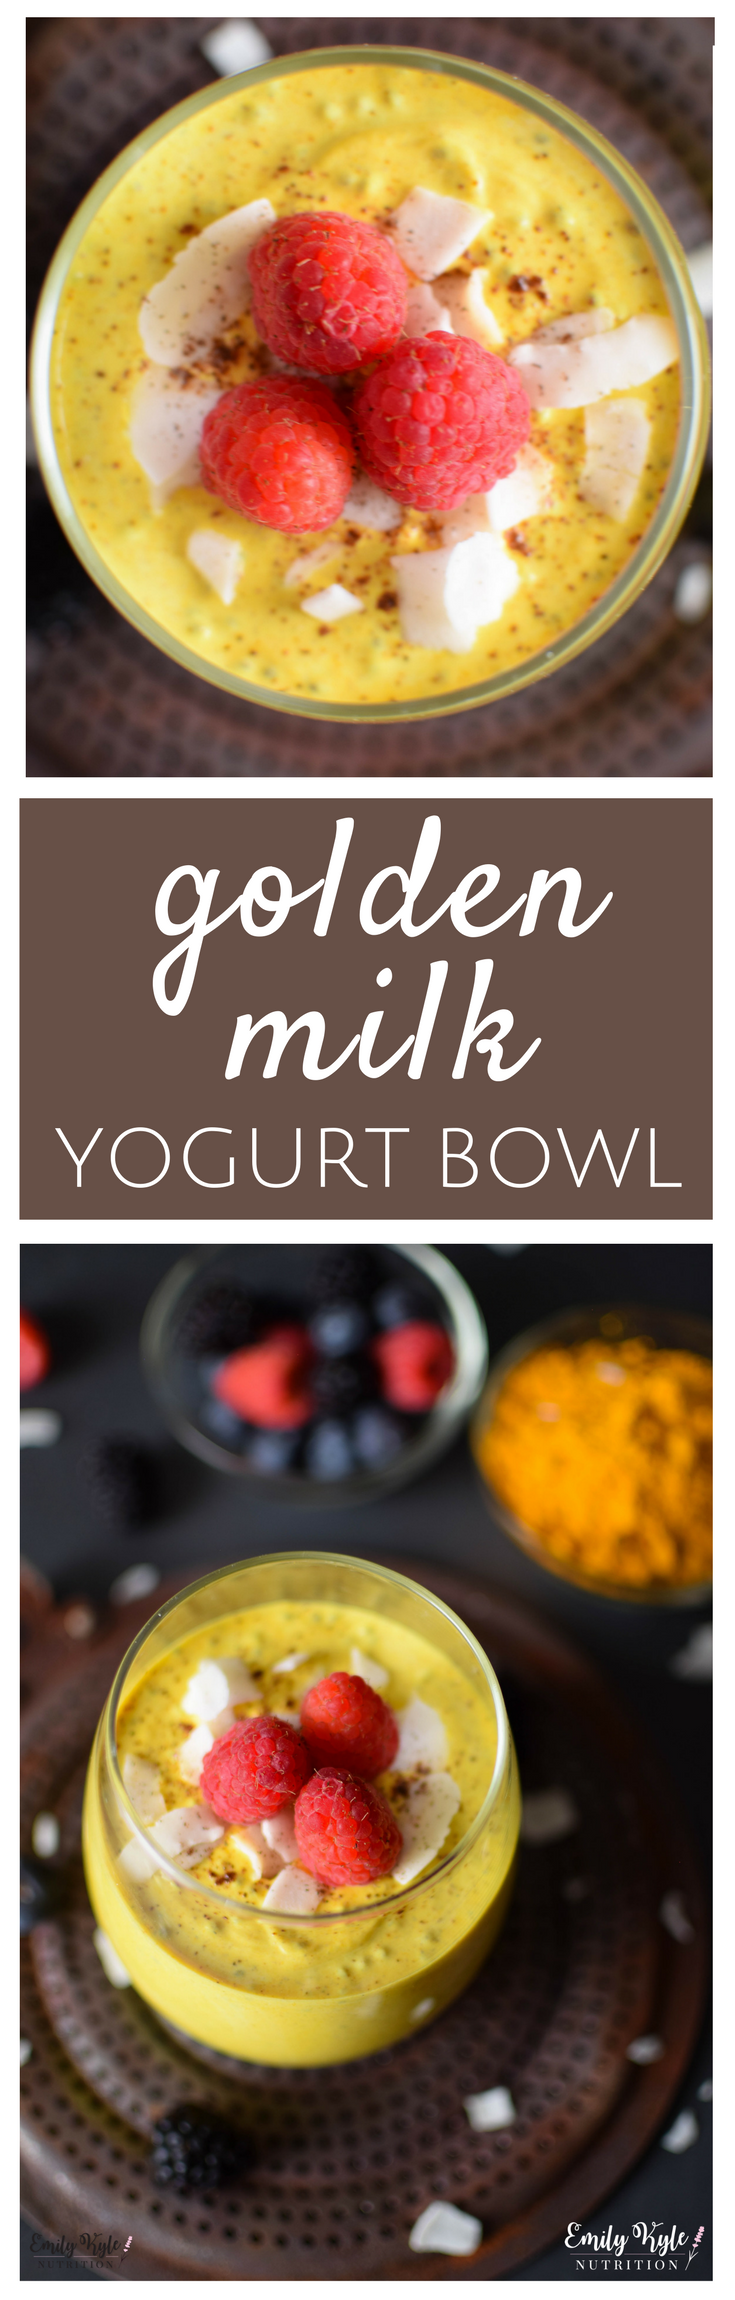 Enjoy the amazing anti-inflammatory health benefits of Turmeric in this high protein, easy-to-make Turmeric Golden Milk Yogurt Bowl! via @EmKyleNutrition